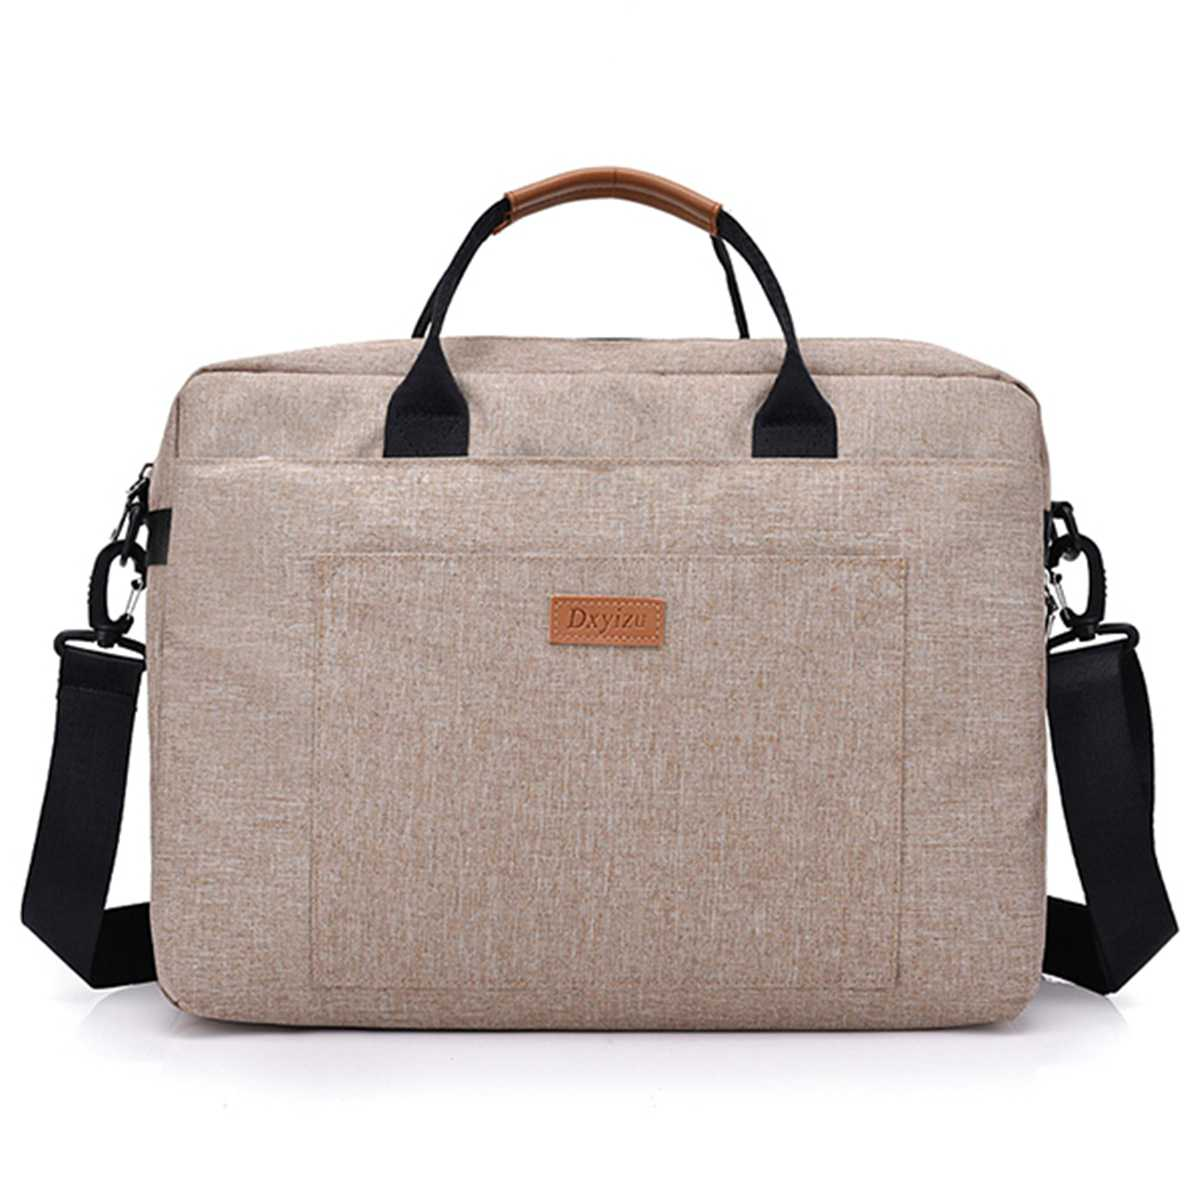 Casual Business Computer Bag Women Men Canvas Briefcase 16 Inch Laptop Shoulder Bag For Female Male Handbag Travel Large Tote